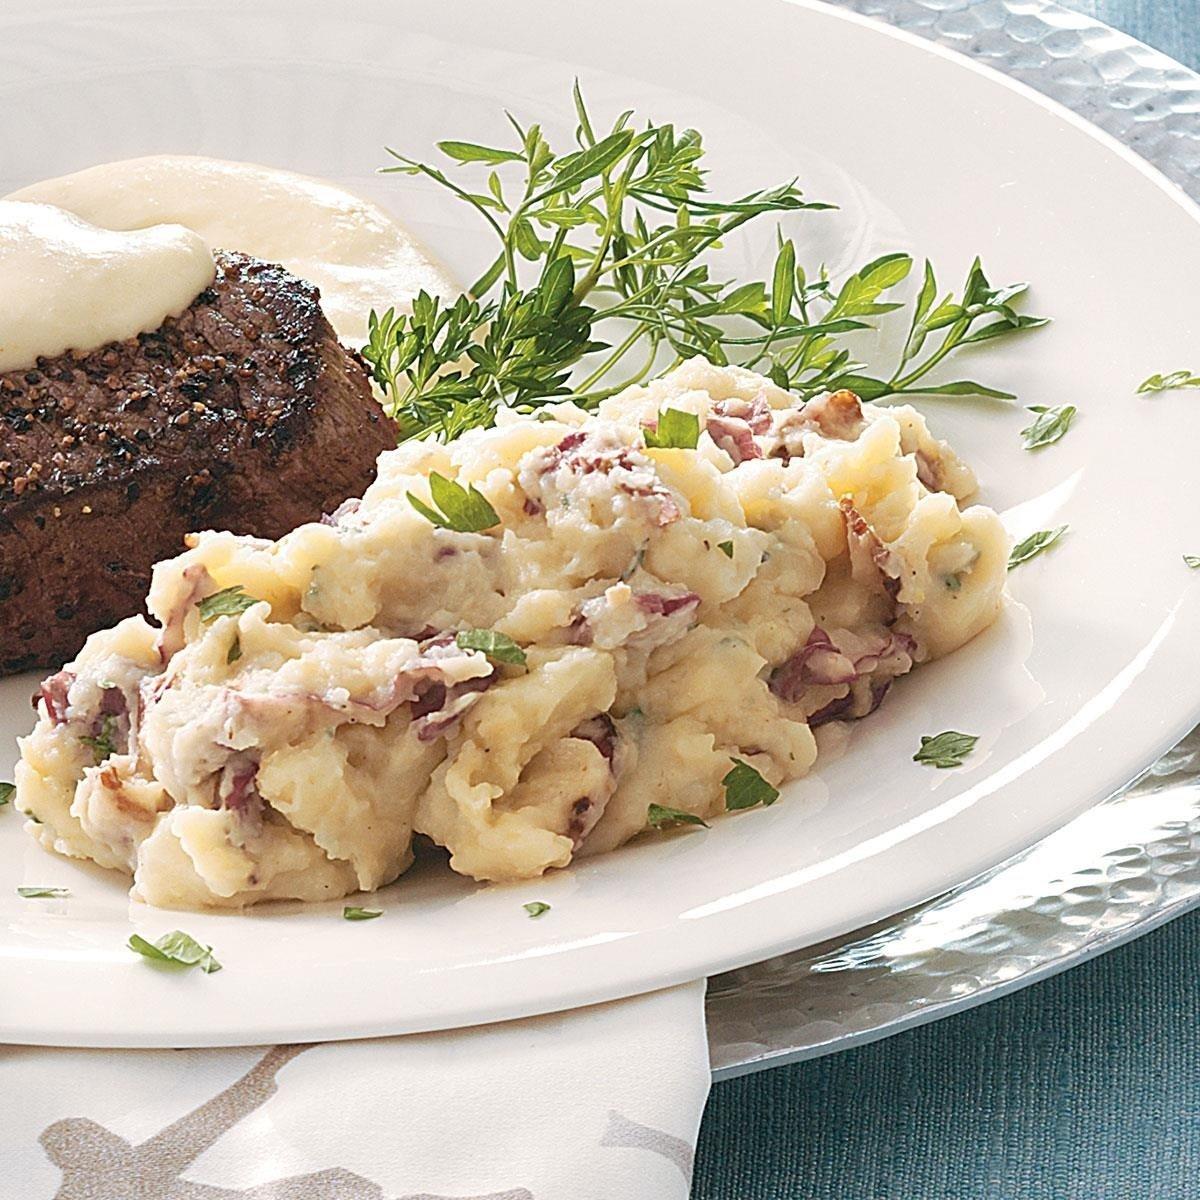 10 Fashionable Dinner Ideas With Mashed Potatoes garlic bacon stilton mashed potatoes recipe taste of home 2021